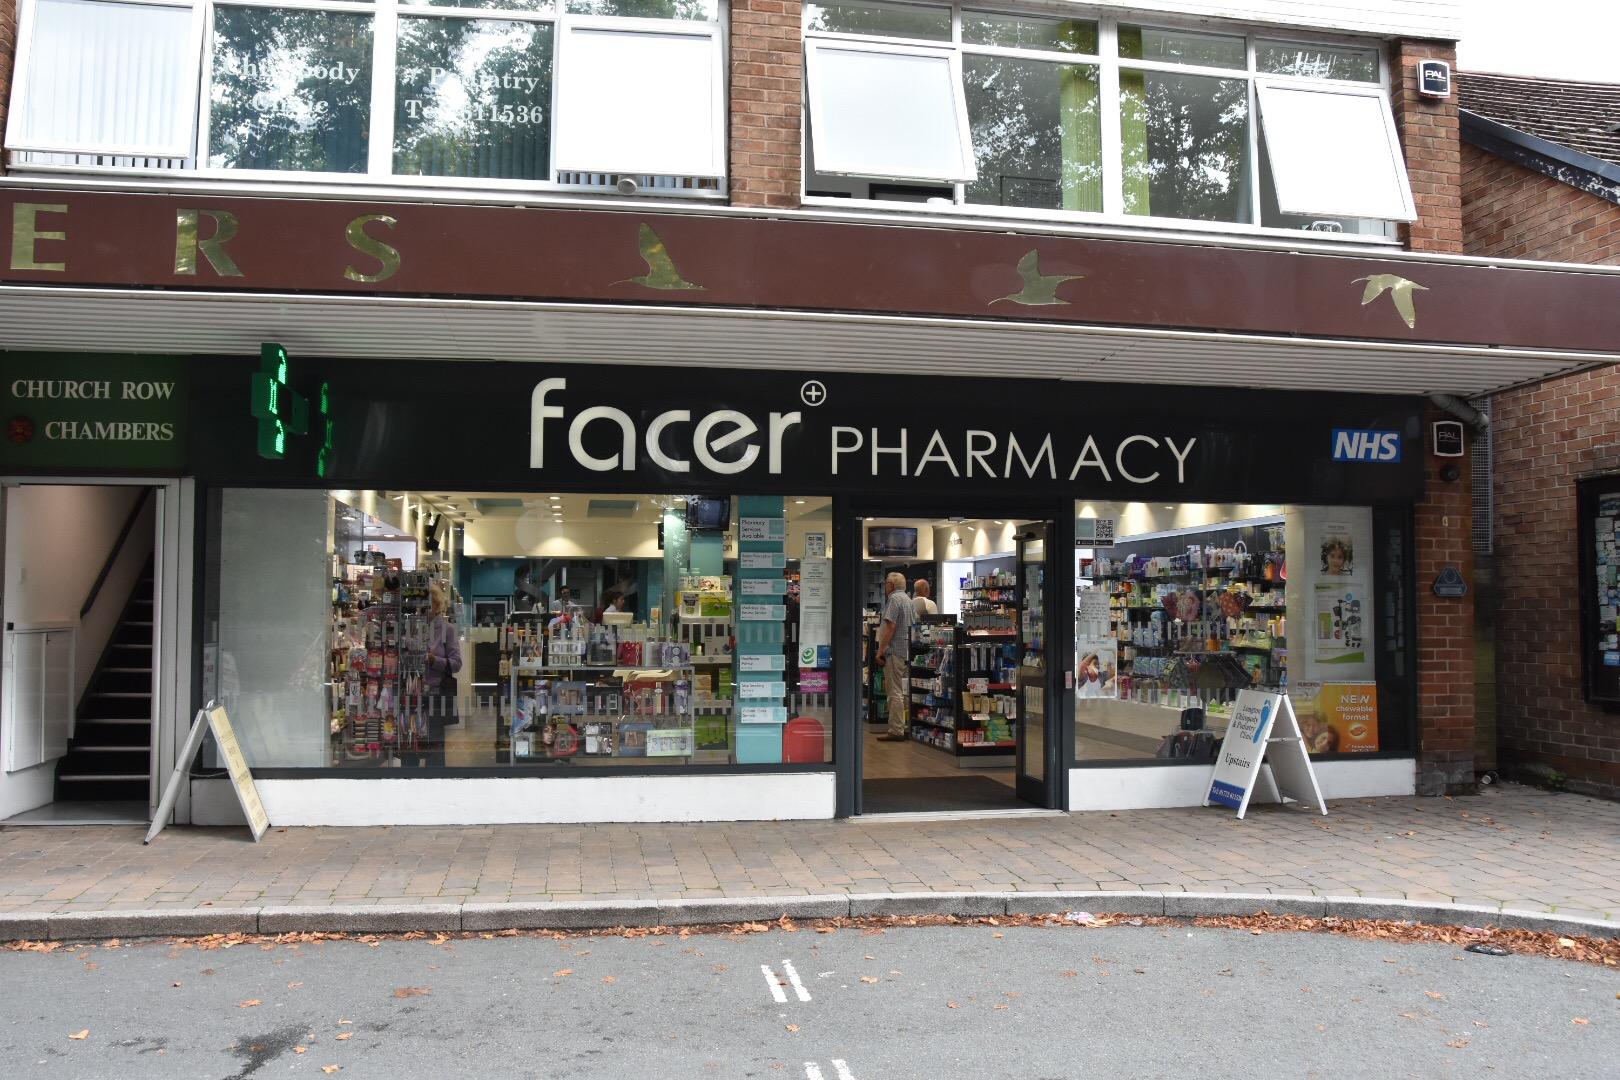 http://facerpharmacy.co.uk/wp-content/uploads/2015/12/IMG_1925.jpg